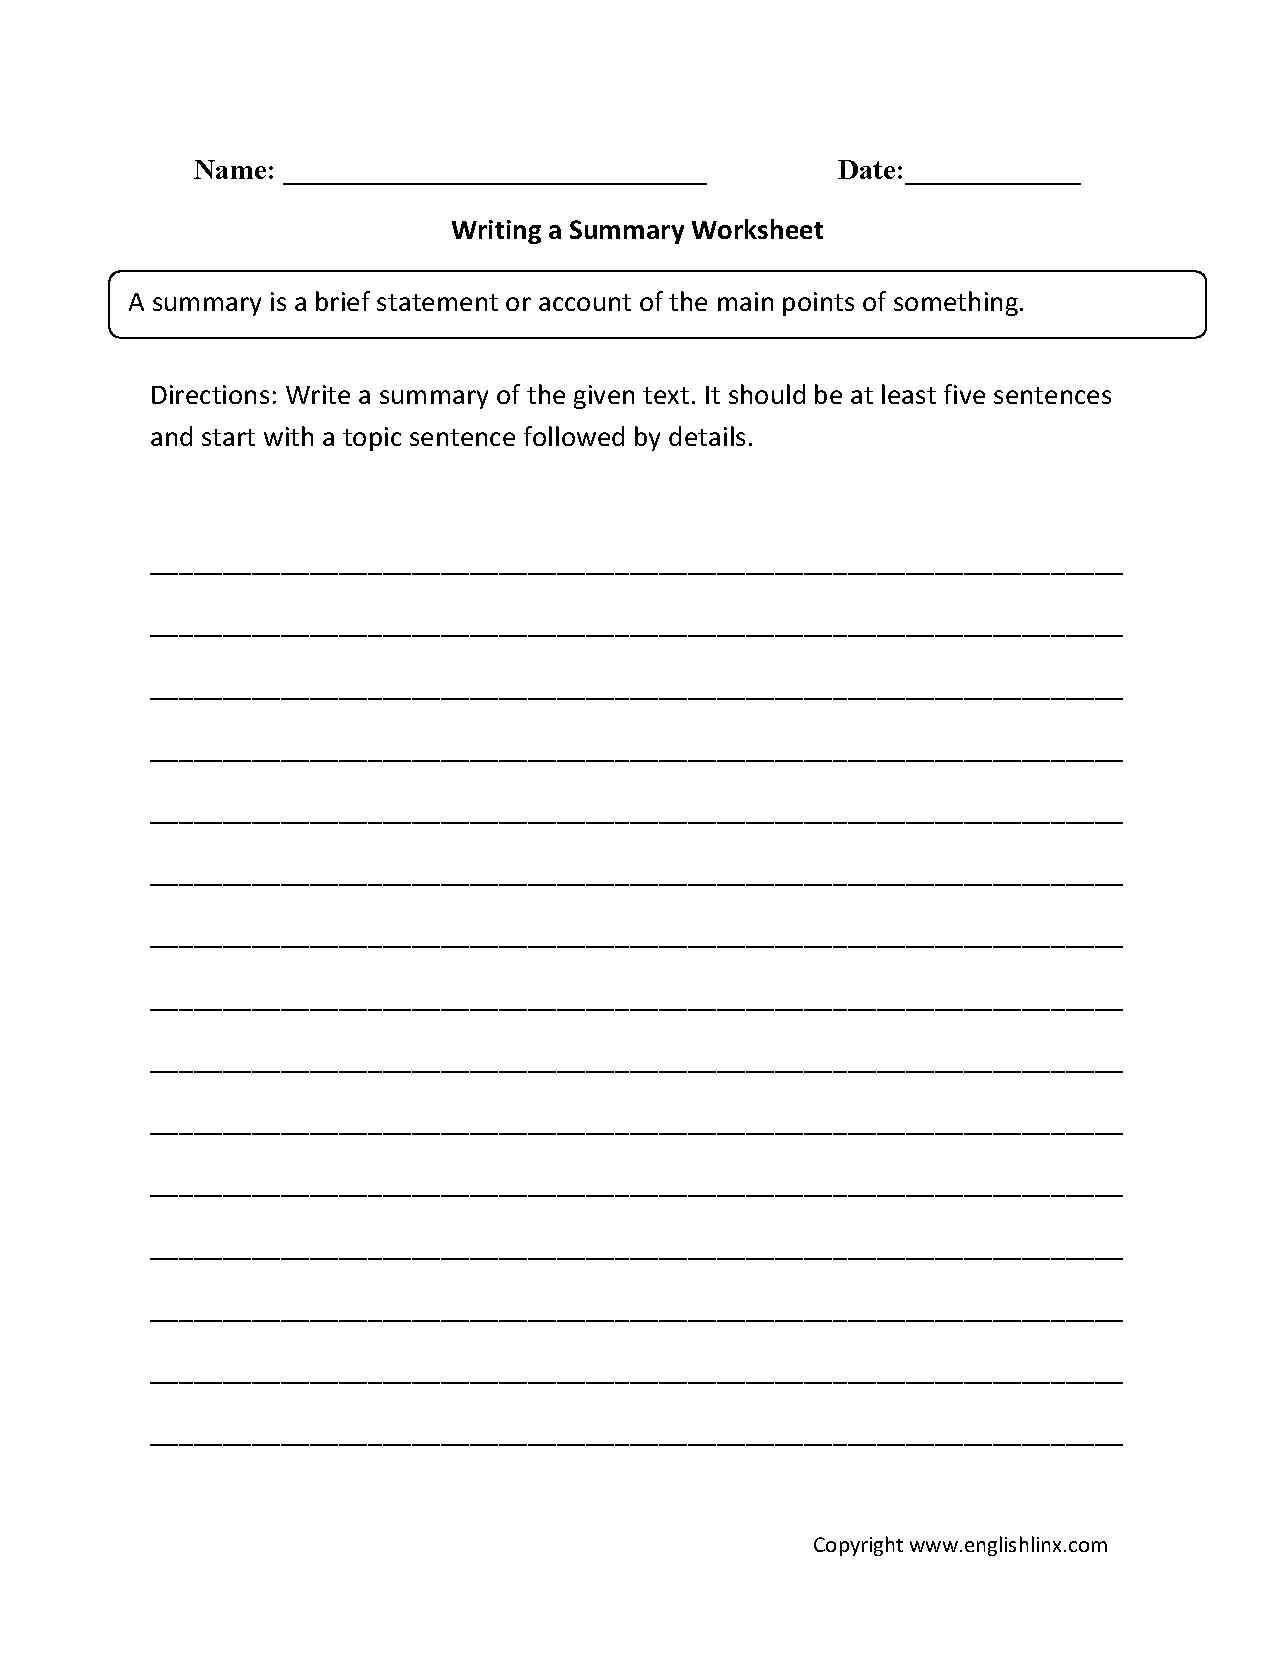 worksheet Summary Worksheet writing a summary worksheet ela block pinterest worksheets and worksheet